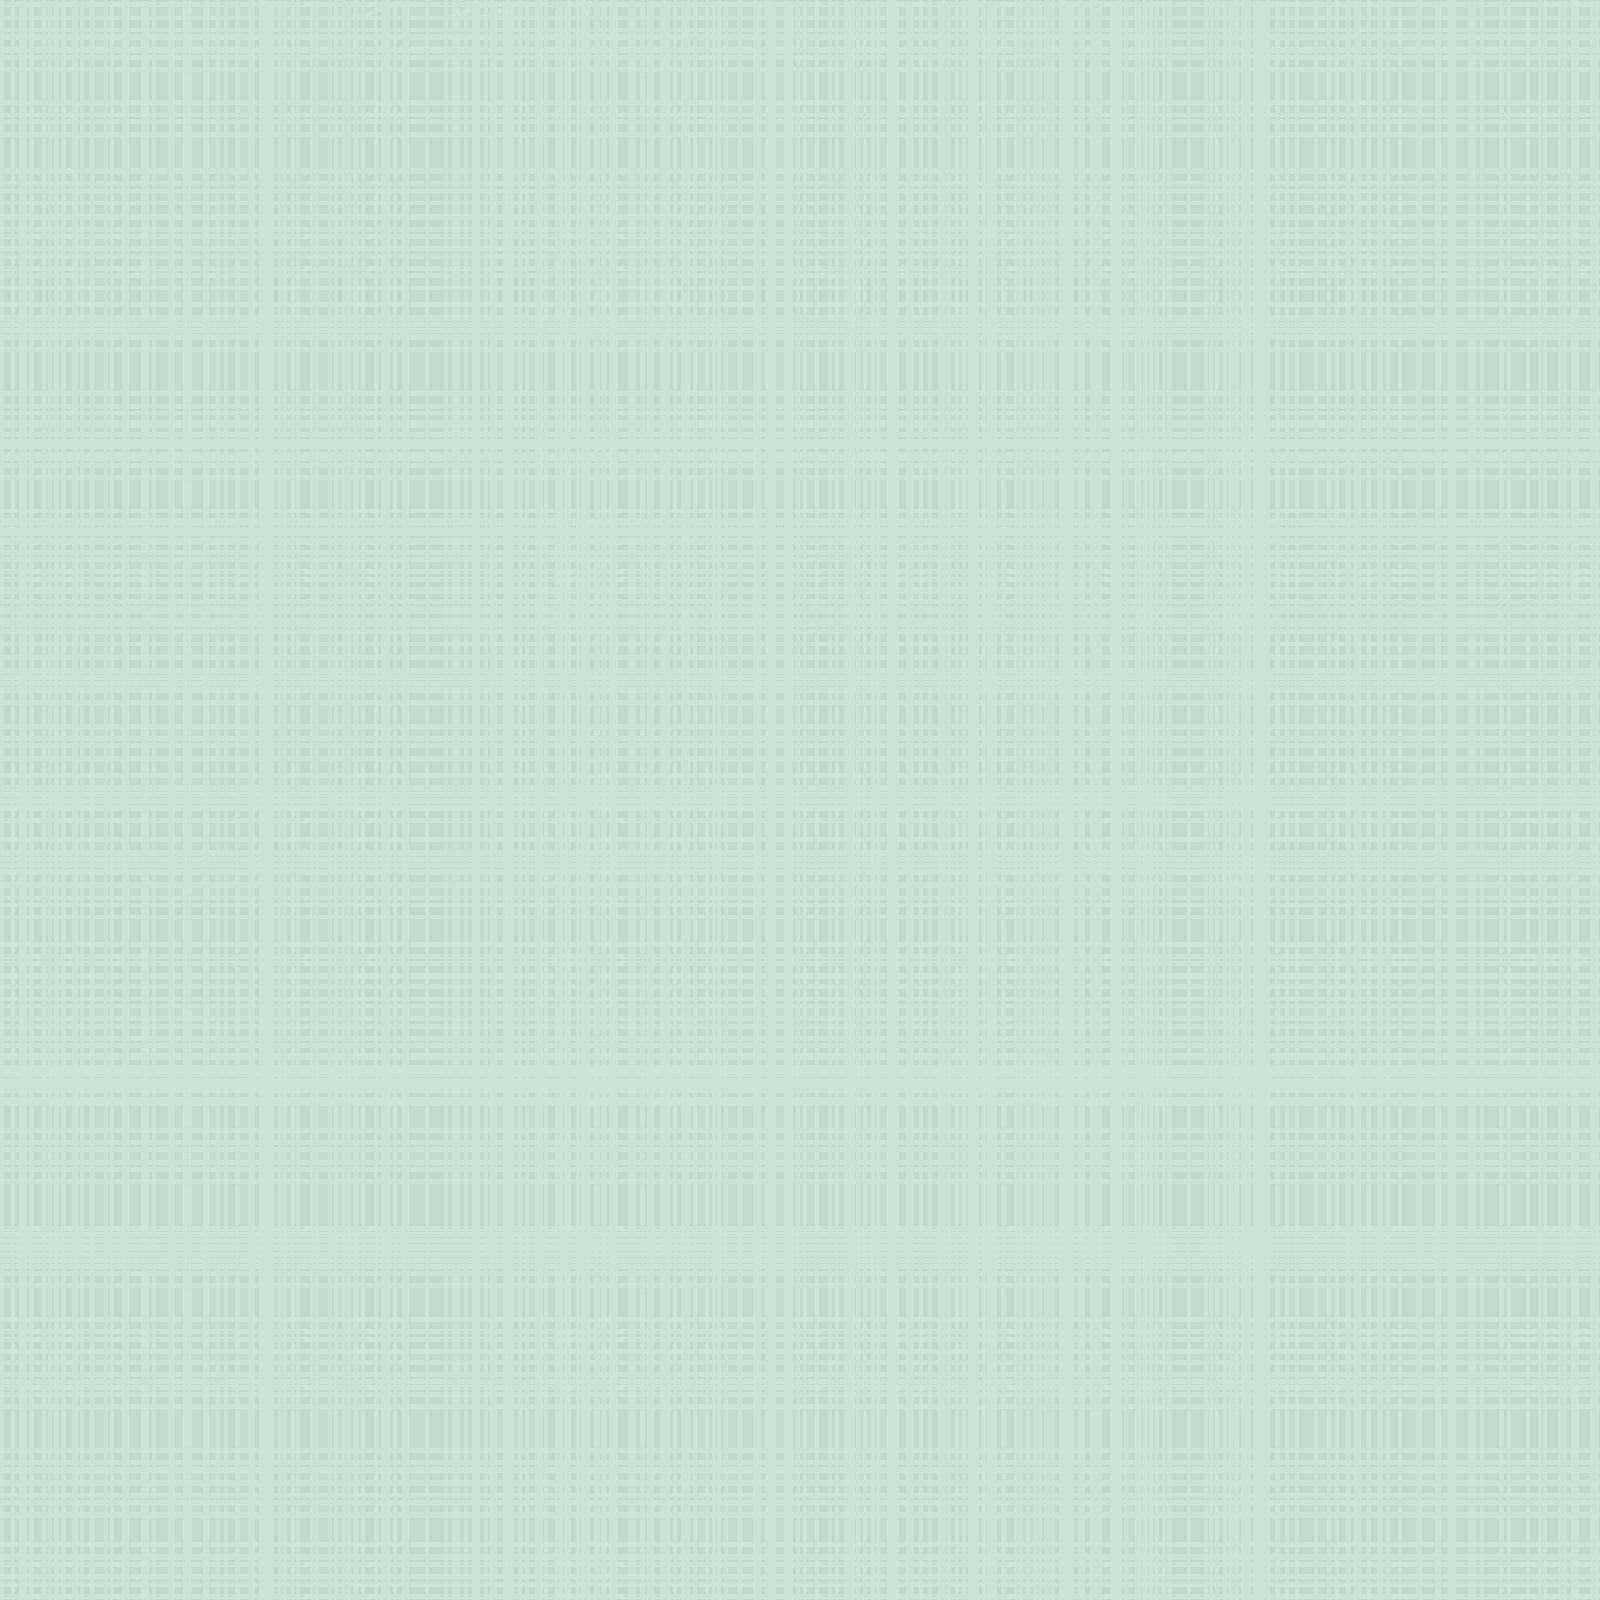 Tecido Tricoline Estampado Textura Verde 1292vr083